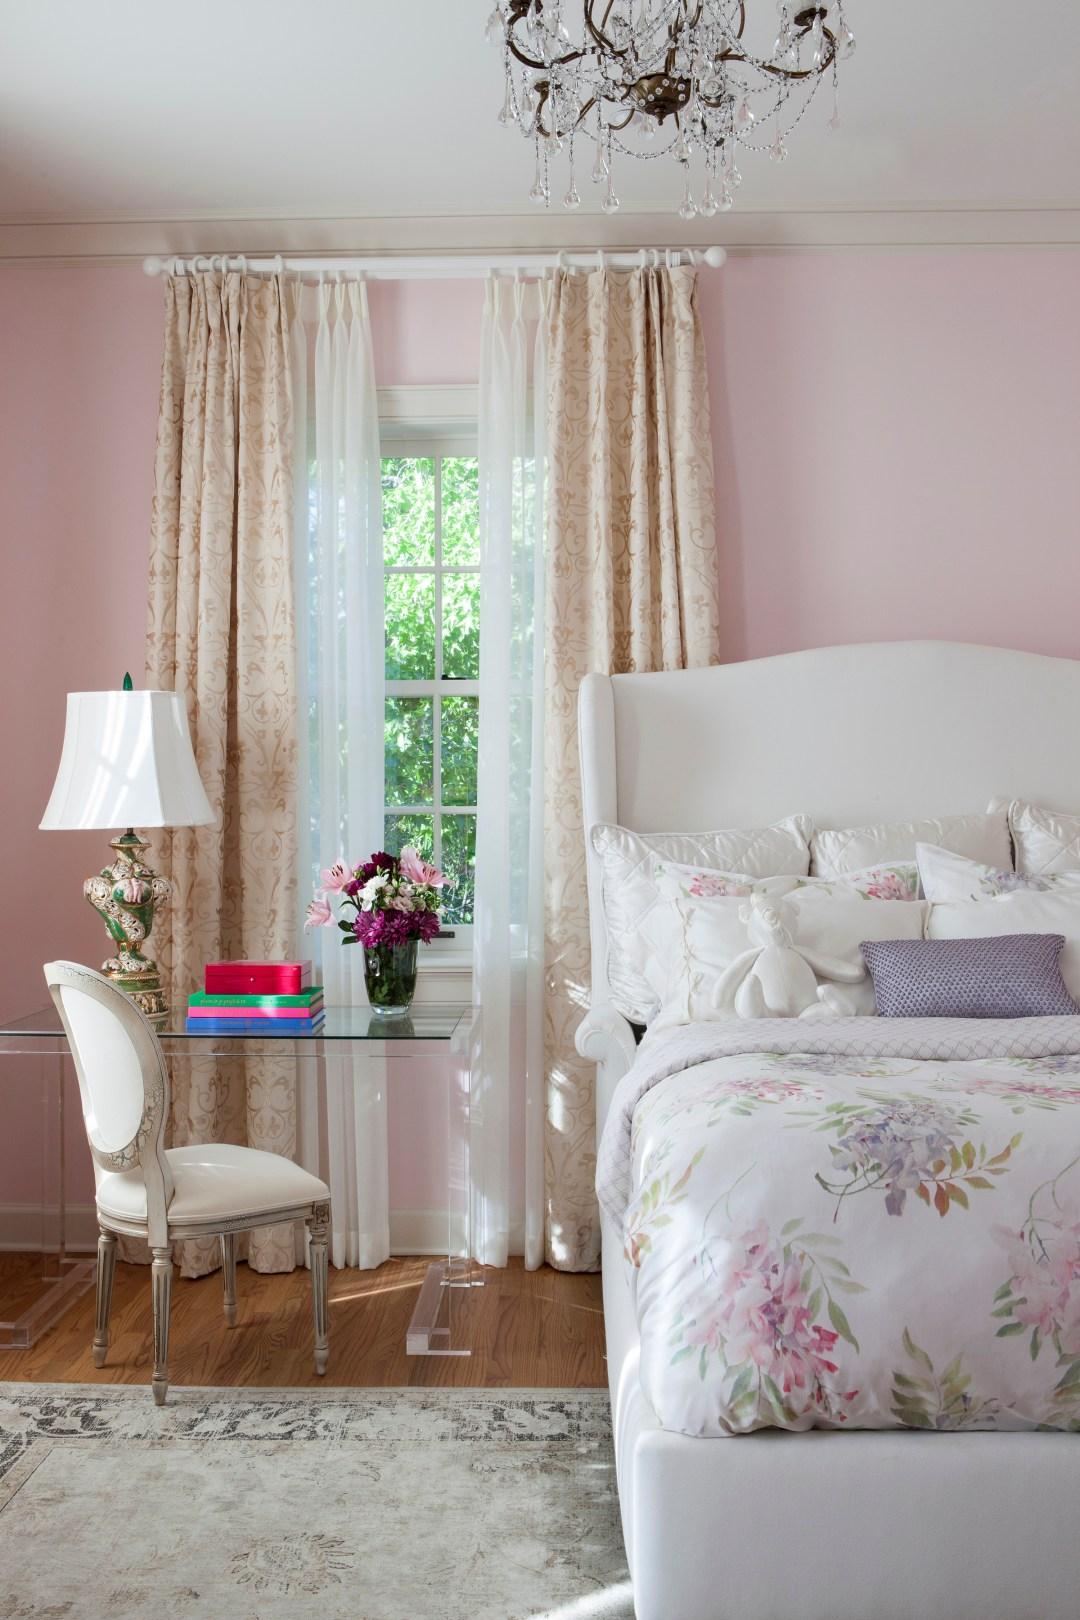 pink pastel french inspired bedroom design by celebrity interior designer Lori Dennis in Los Angeles